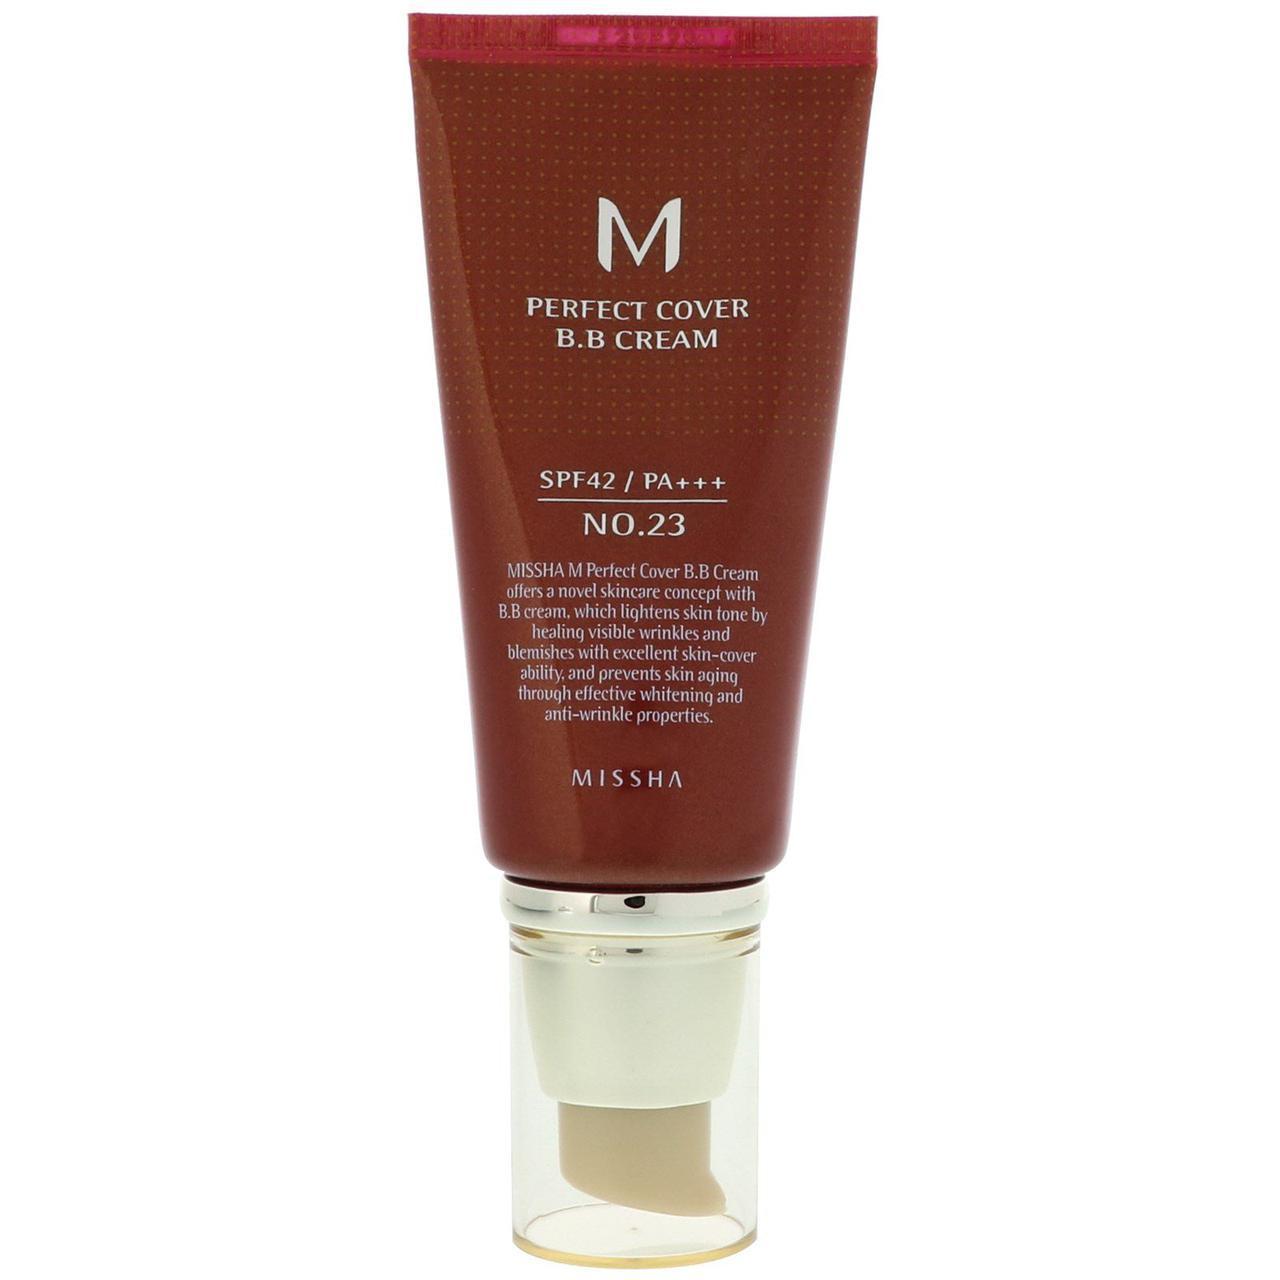 ВВ-крем для лица Missha M Perfect Cover BB Cream SPF42/PA+++ (No.23/Natural Beige) 50 мл